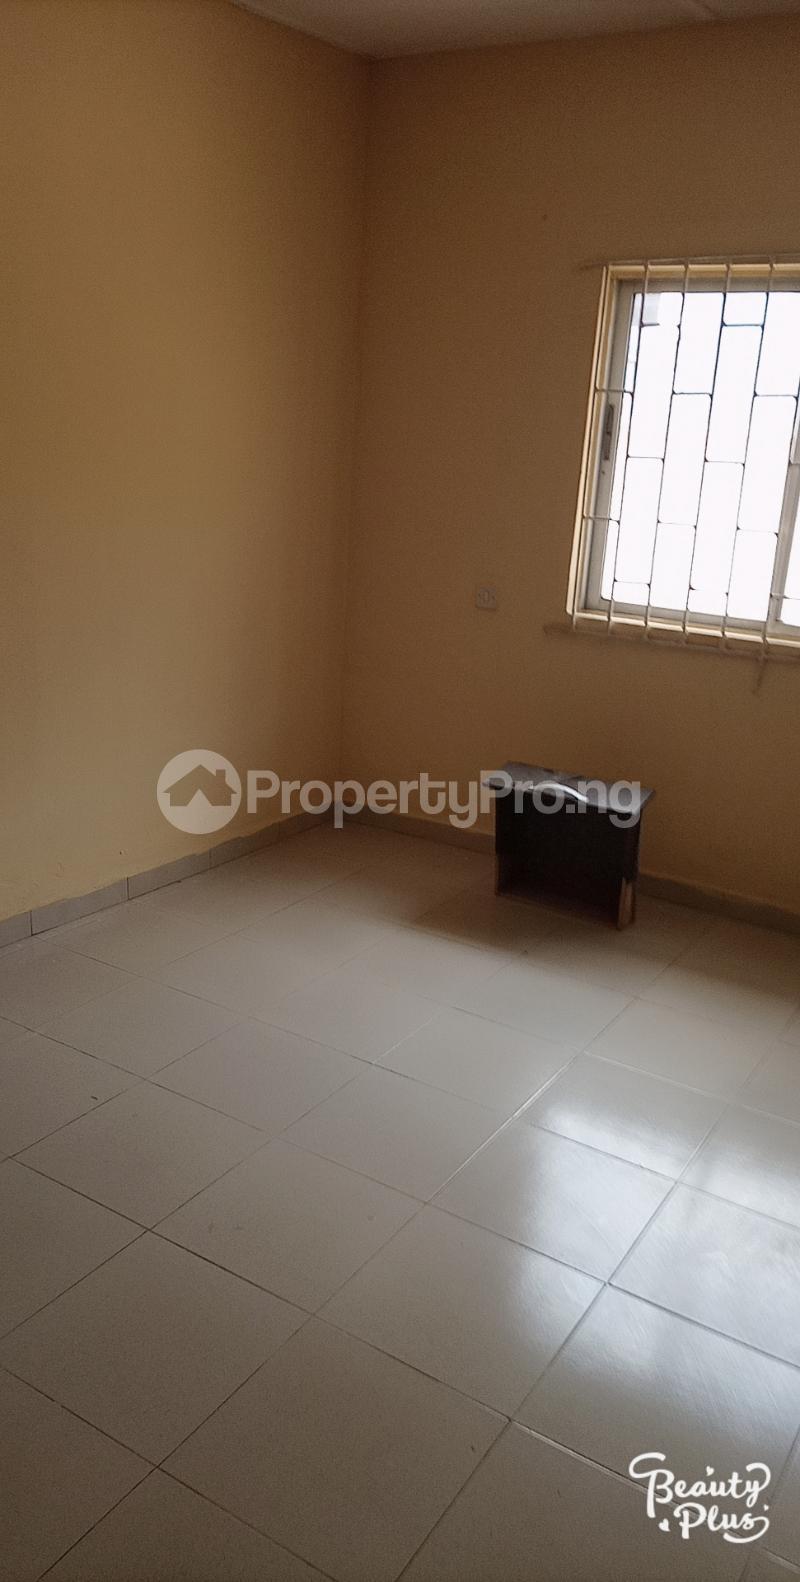 5 bedroom Semi Detached Duplex House for sale Ajao estate Isolo. Lagos Ajao Estate Isolo Lagos - 7